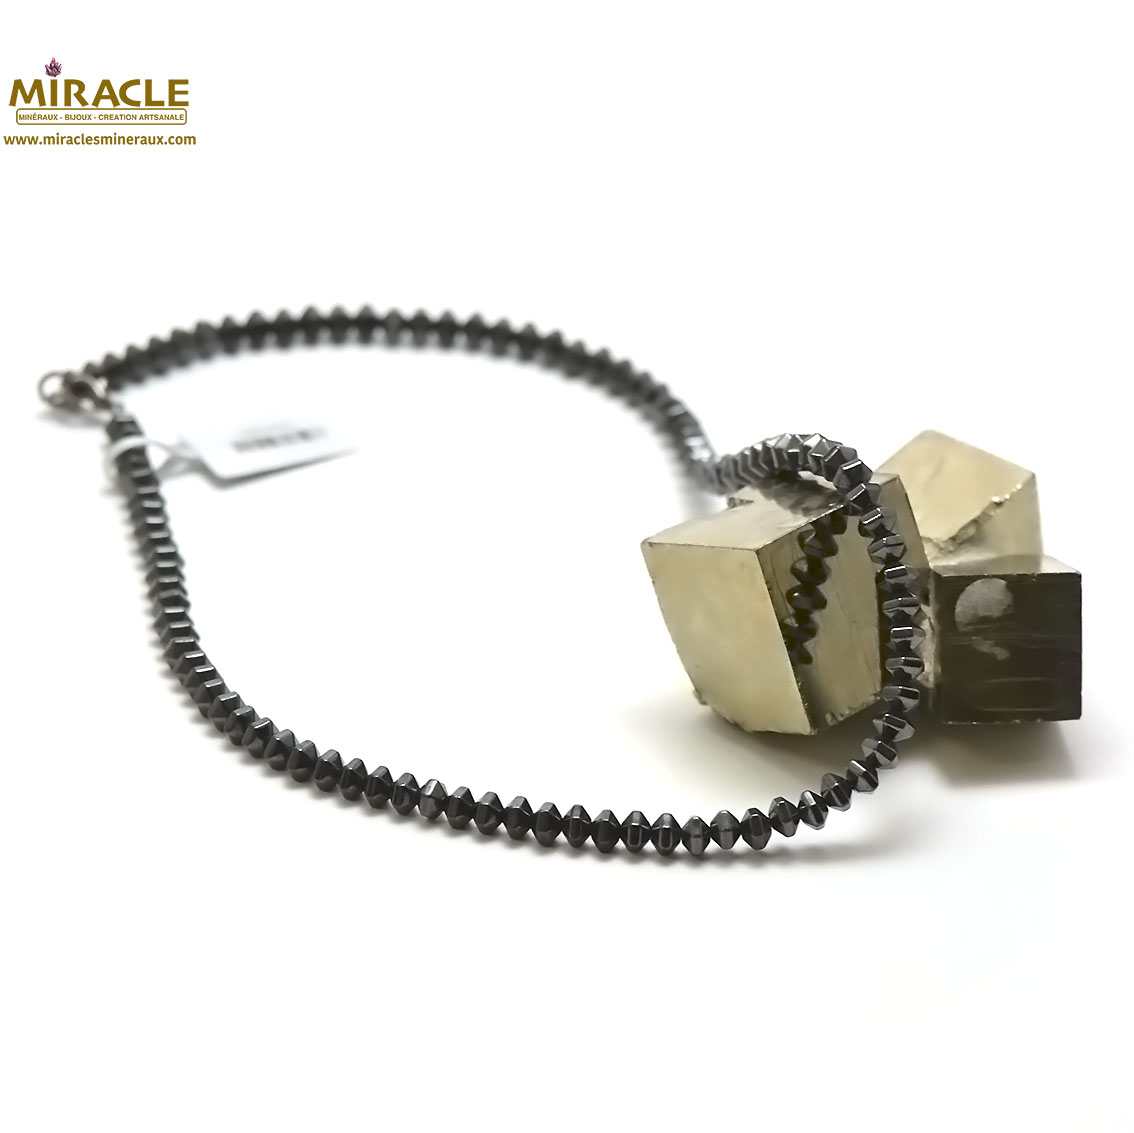 collier hématite, perle rondelle hexagonale